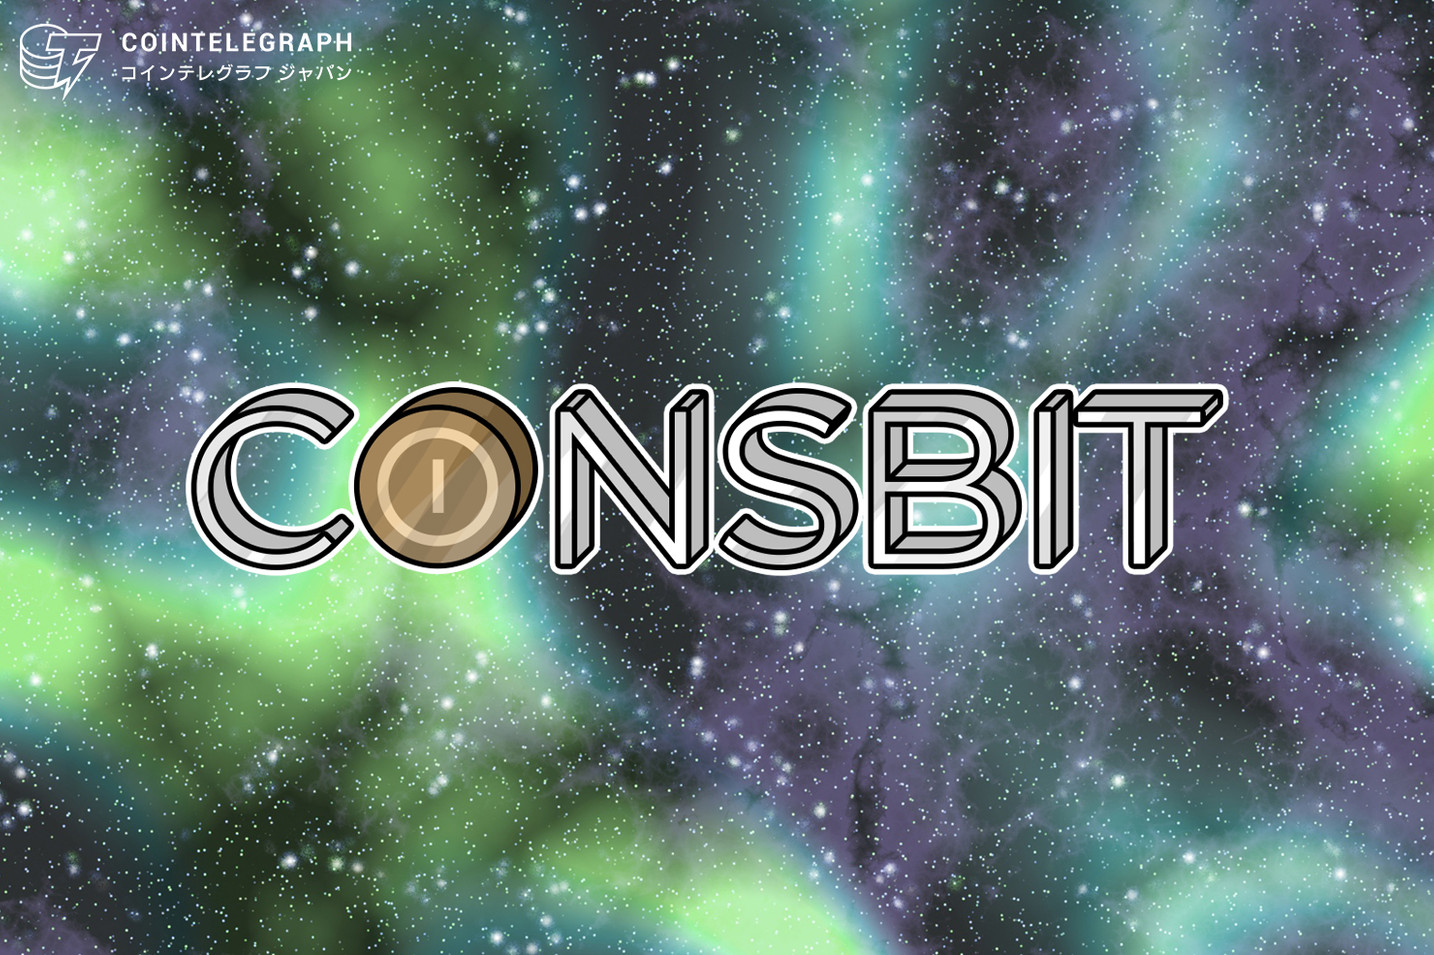 Coinsbitの紹介プログラム:数十万のユーザーに計数百万ドルを進呈